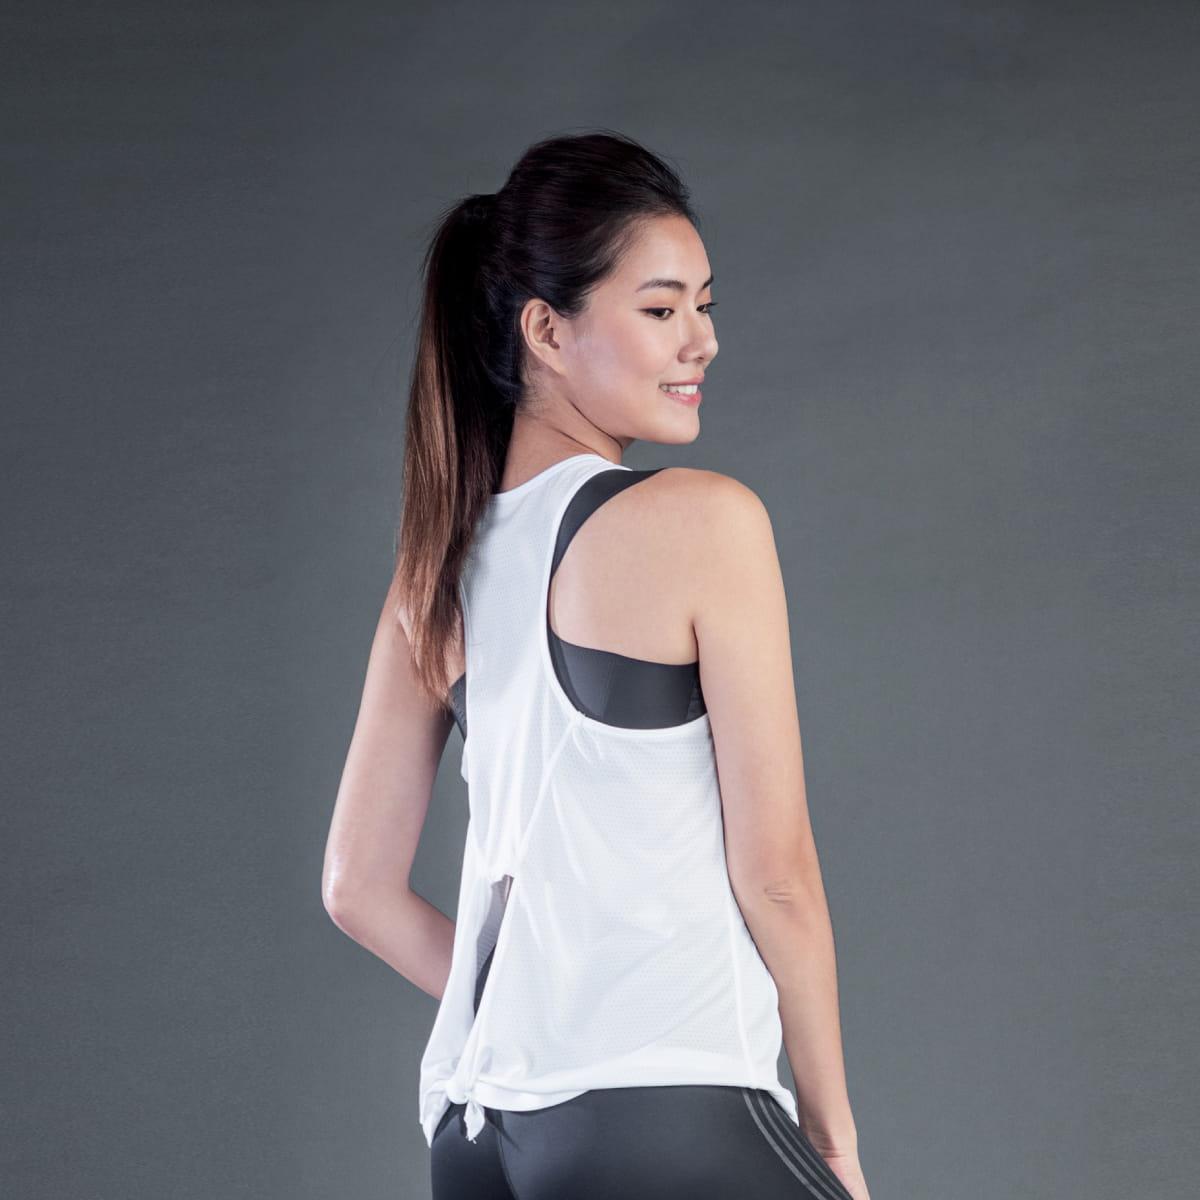 TENO超彈感美型健身褲-Track軌跡 14